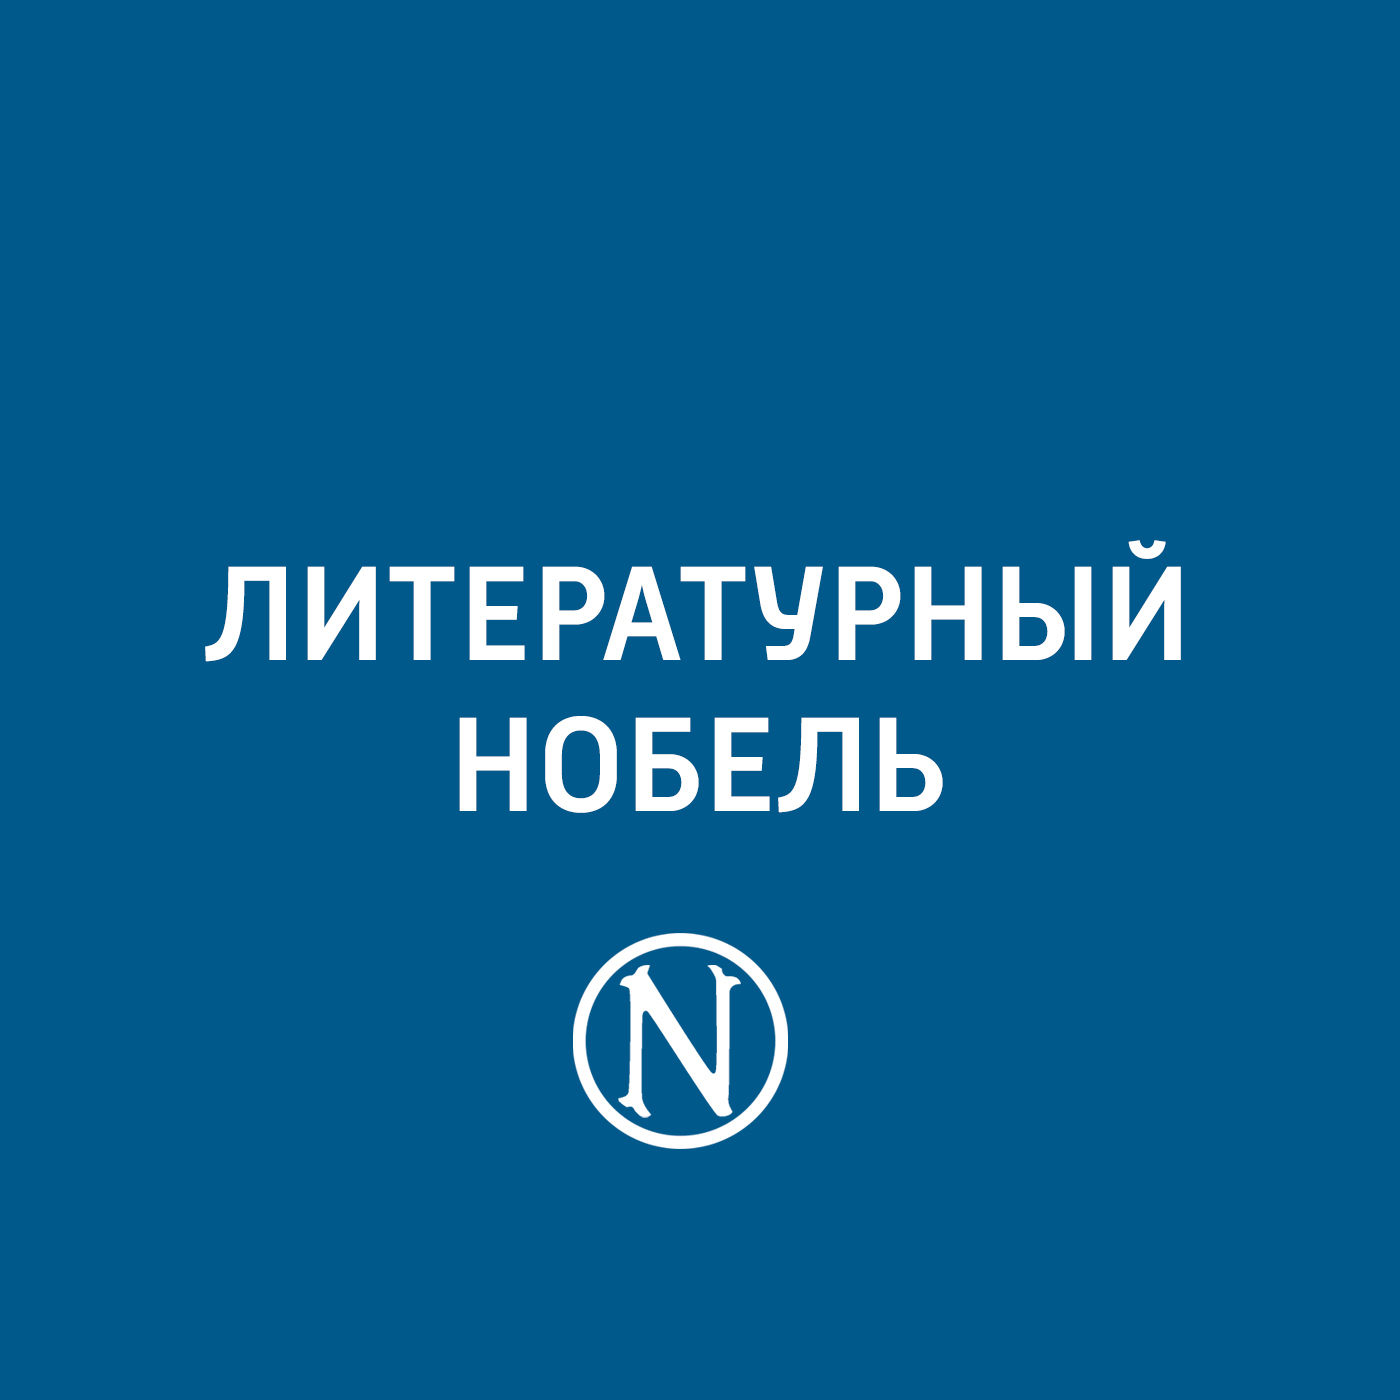 Евгений Стаховский Уильям Фолкнер цена 2017